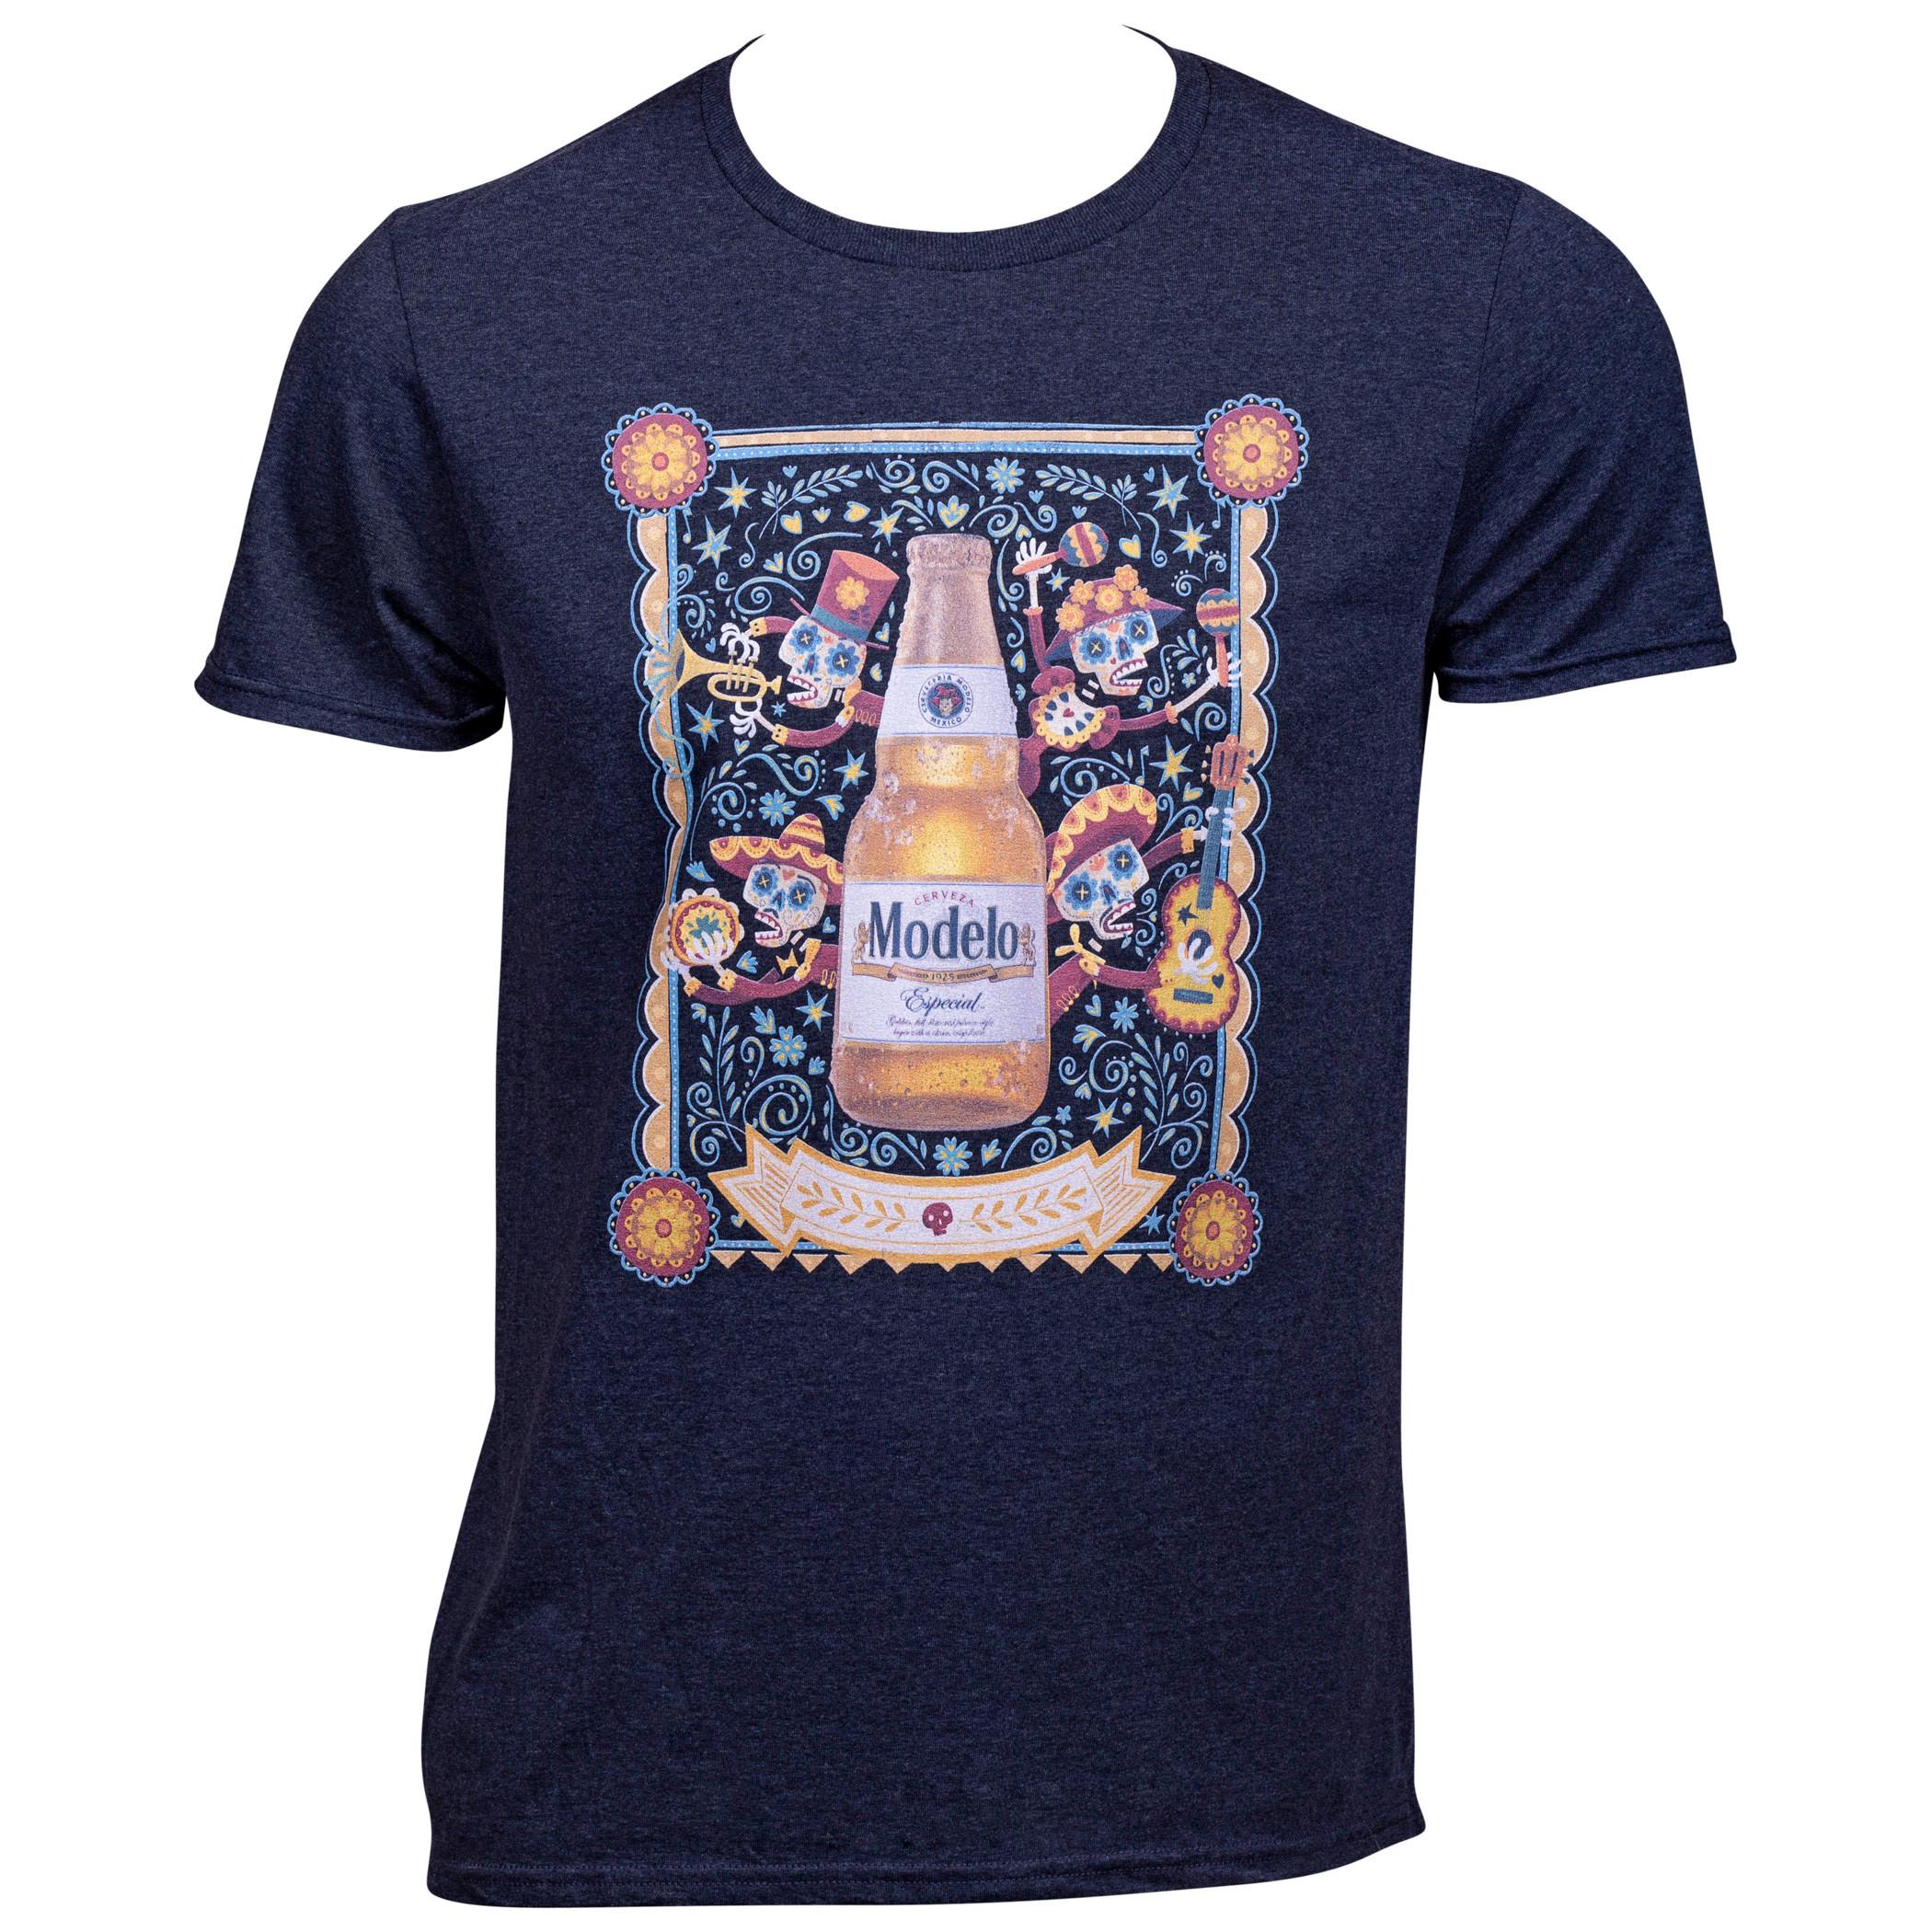 Modelo Especial Fiesta Bottle T-Shirt